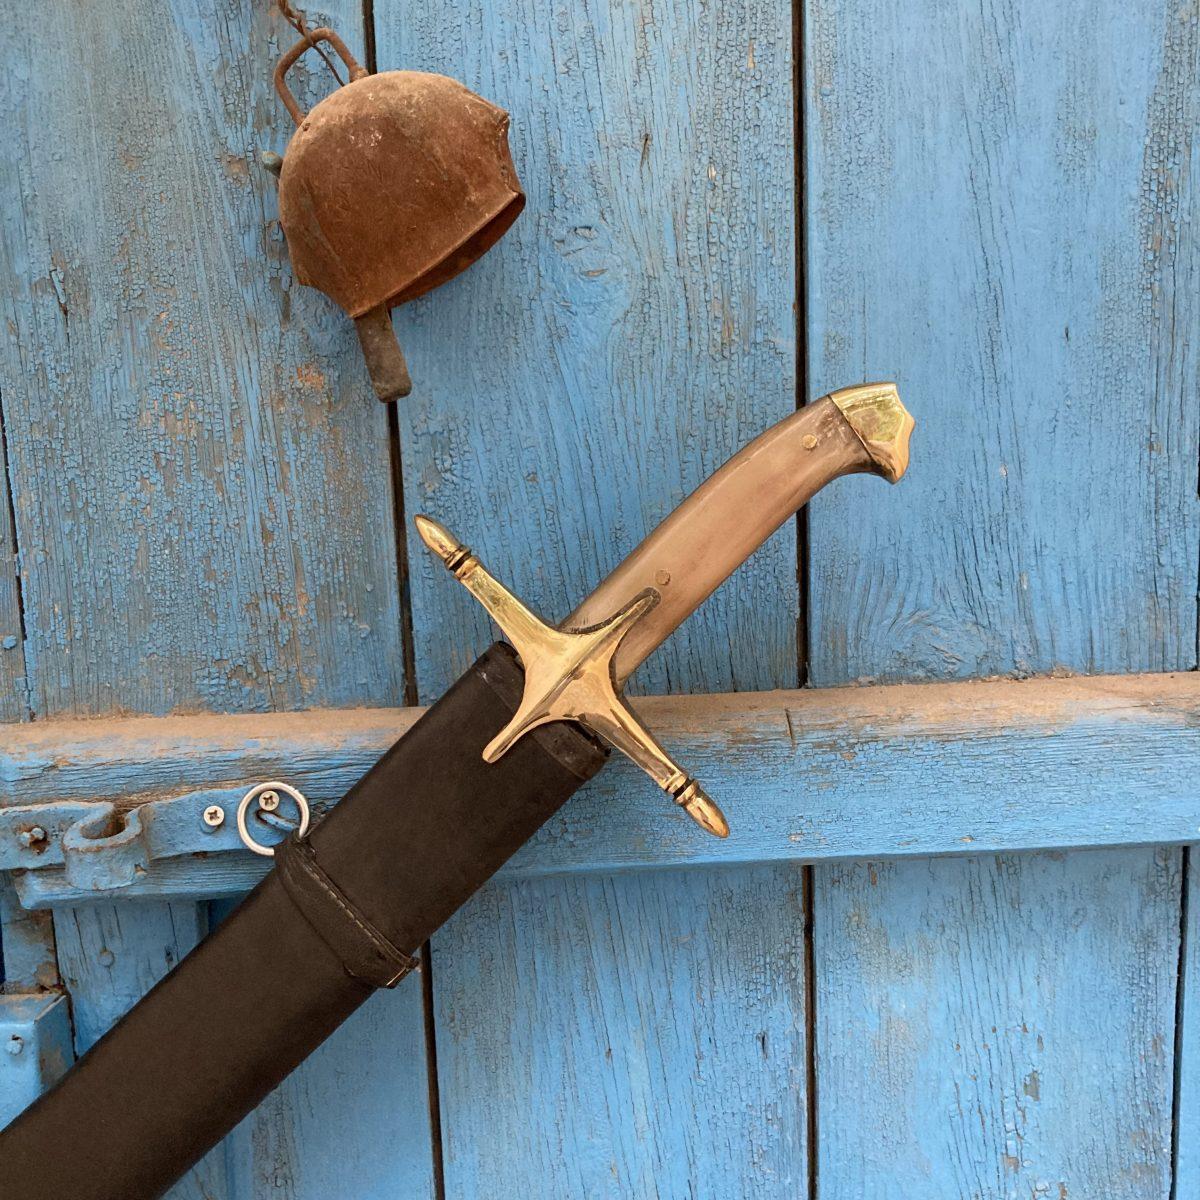 Buy 16 17. Century Ottoman Curved Fuller Horn Handle Sword 7 scaled 16-17. Century Ottoman Curved Fuller Horn Handle Sword